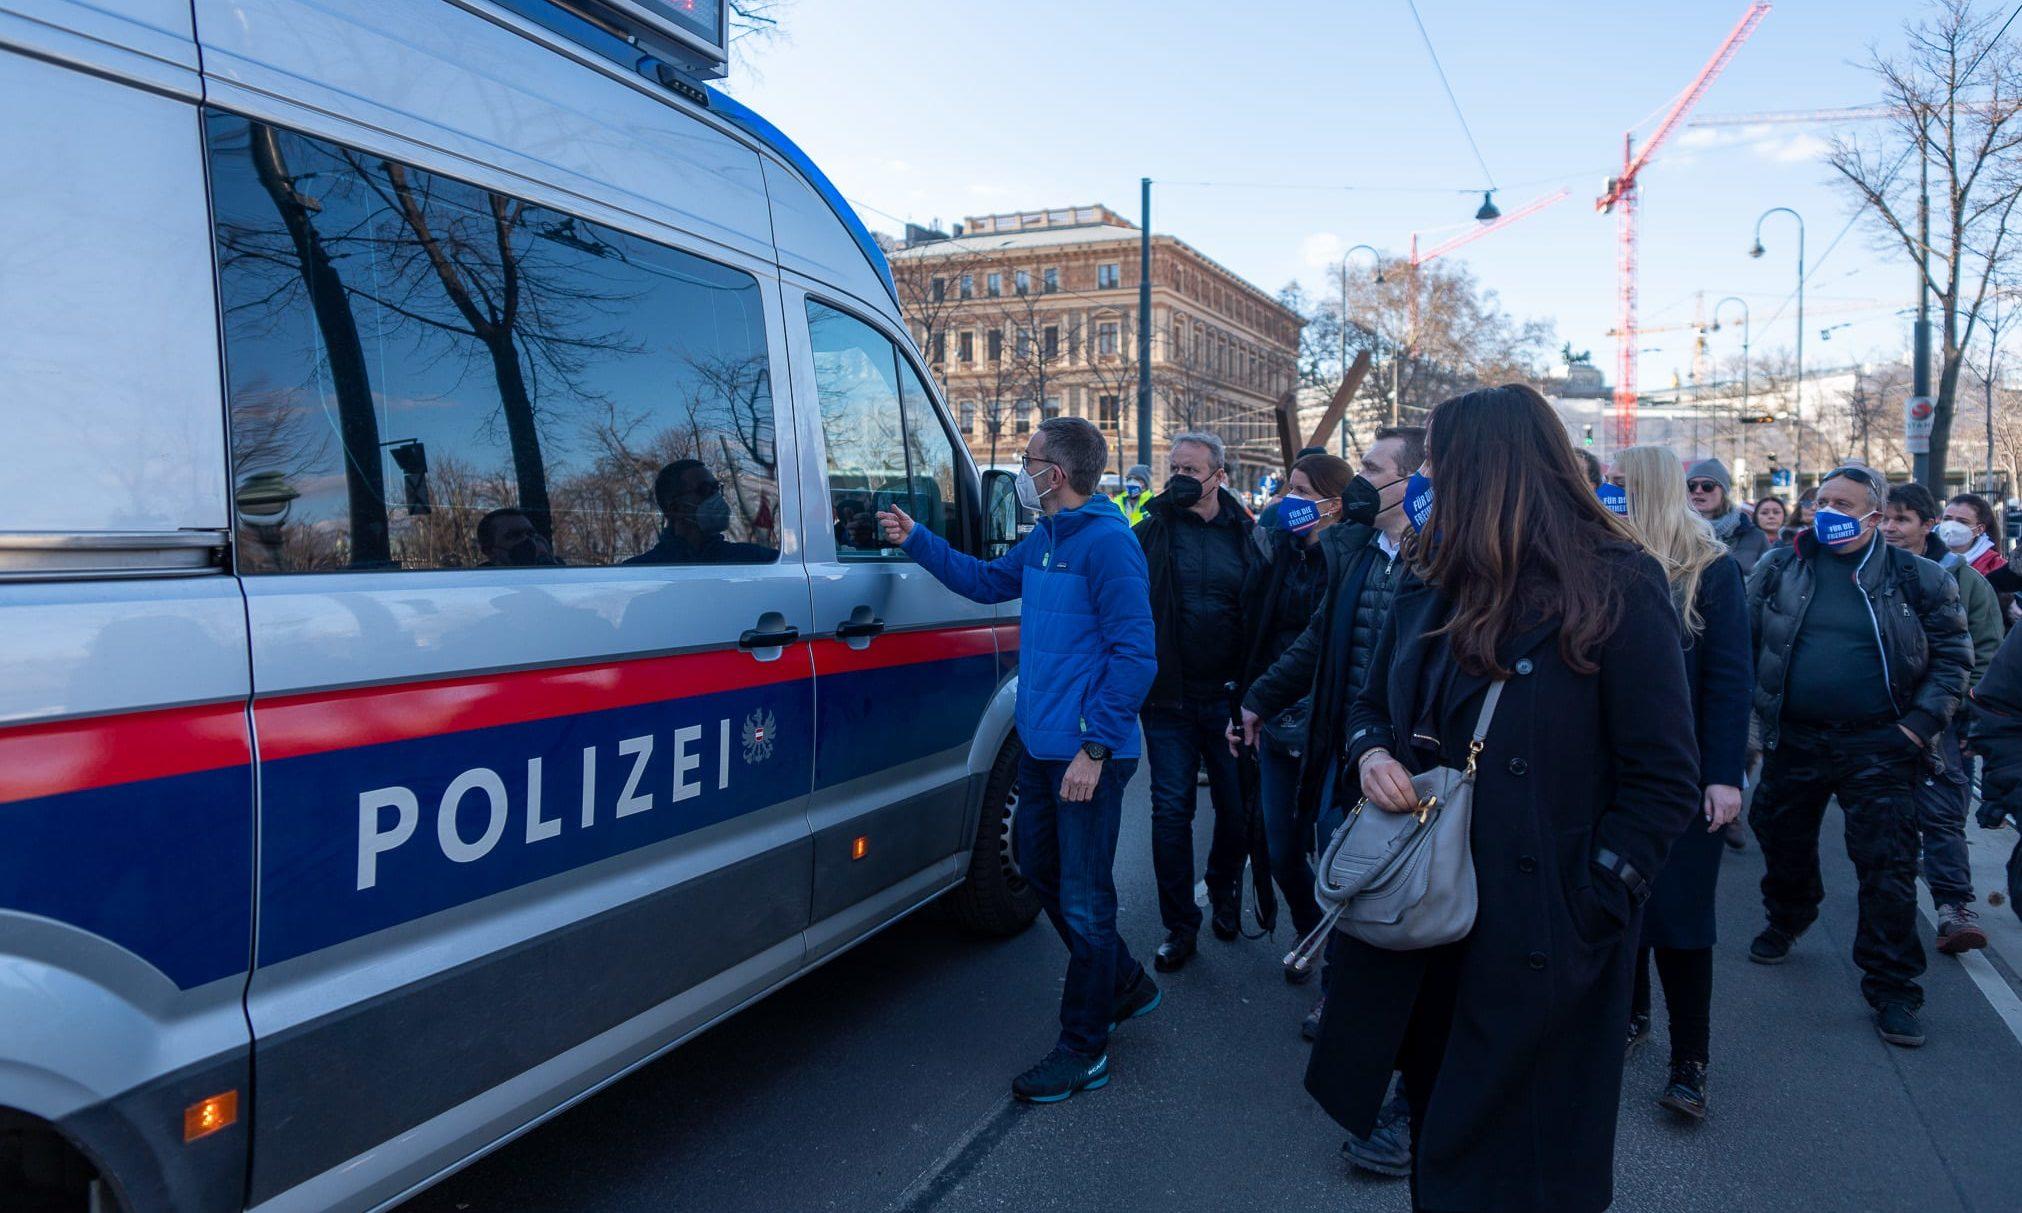 Kickl_Polizeiwagen_ Alois Endl